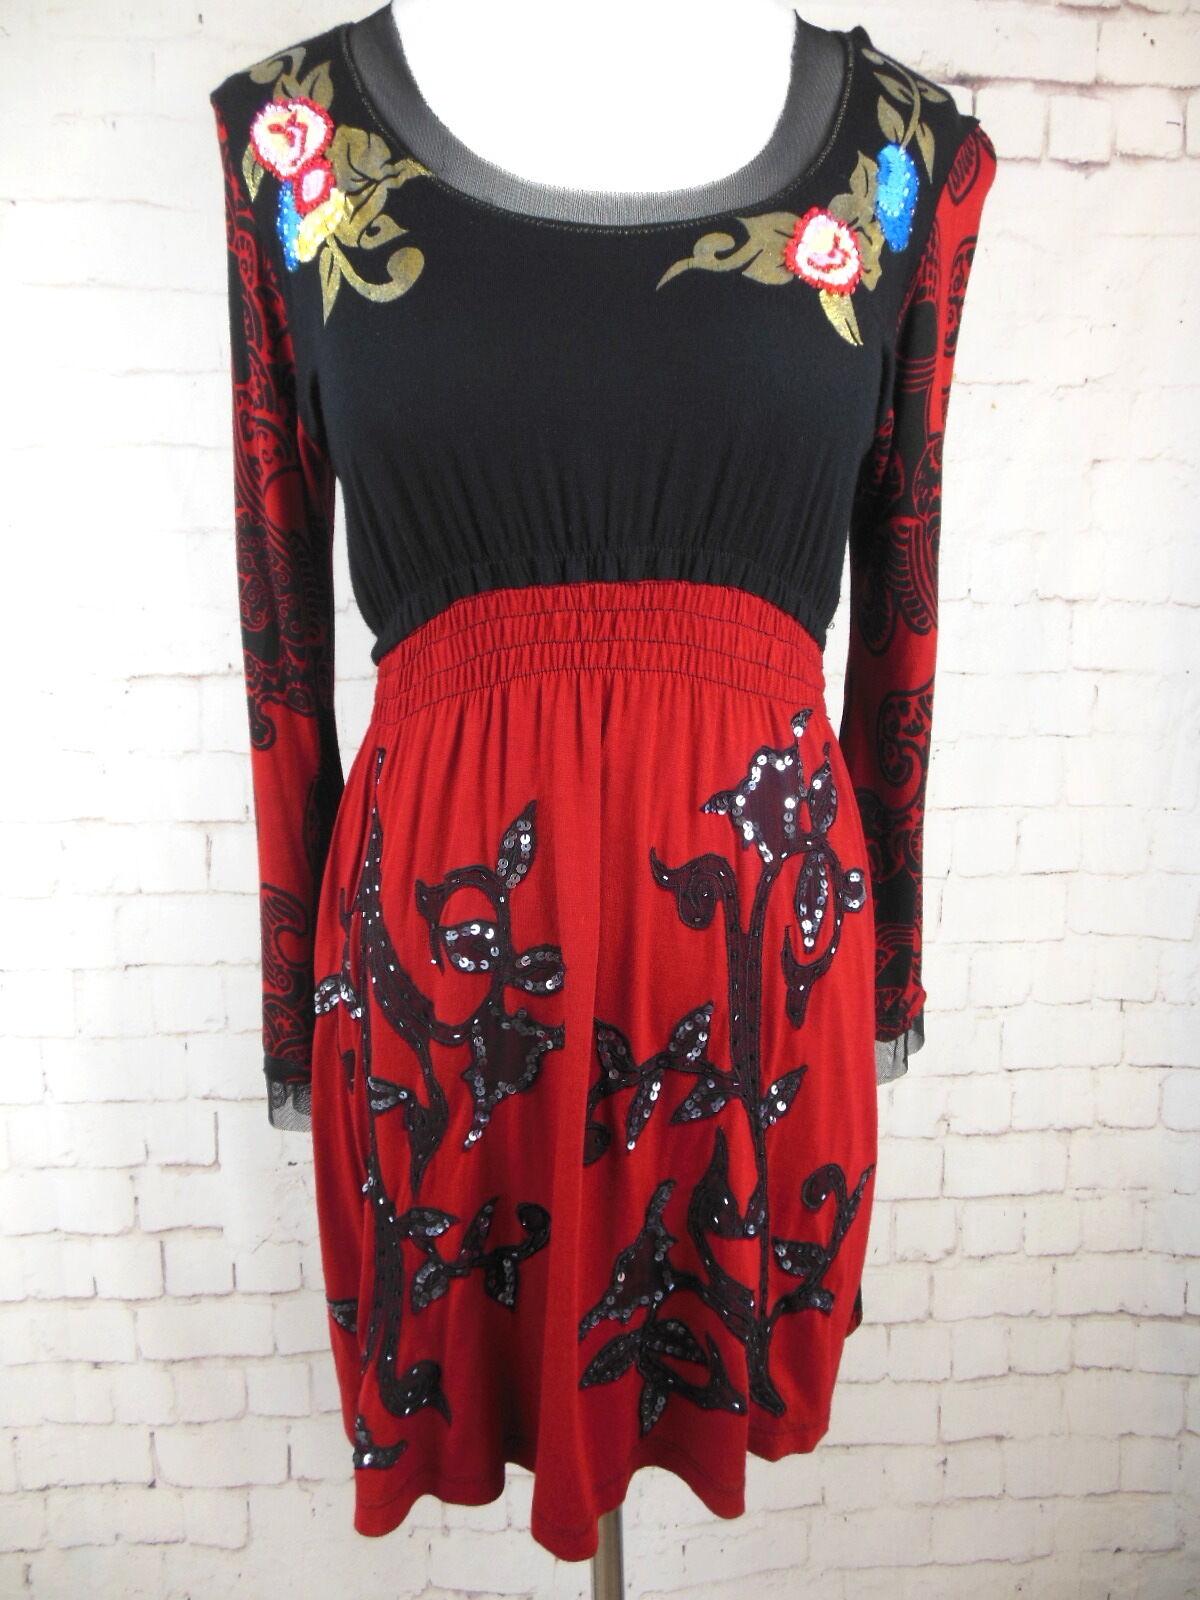 ..KRISTA LEE Multi-Farbe Embellished rot & schwarz Mini Dress or Tunic Sz S